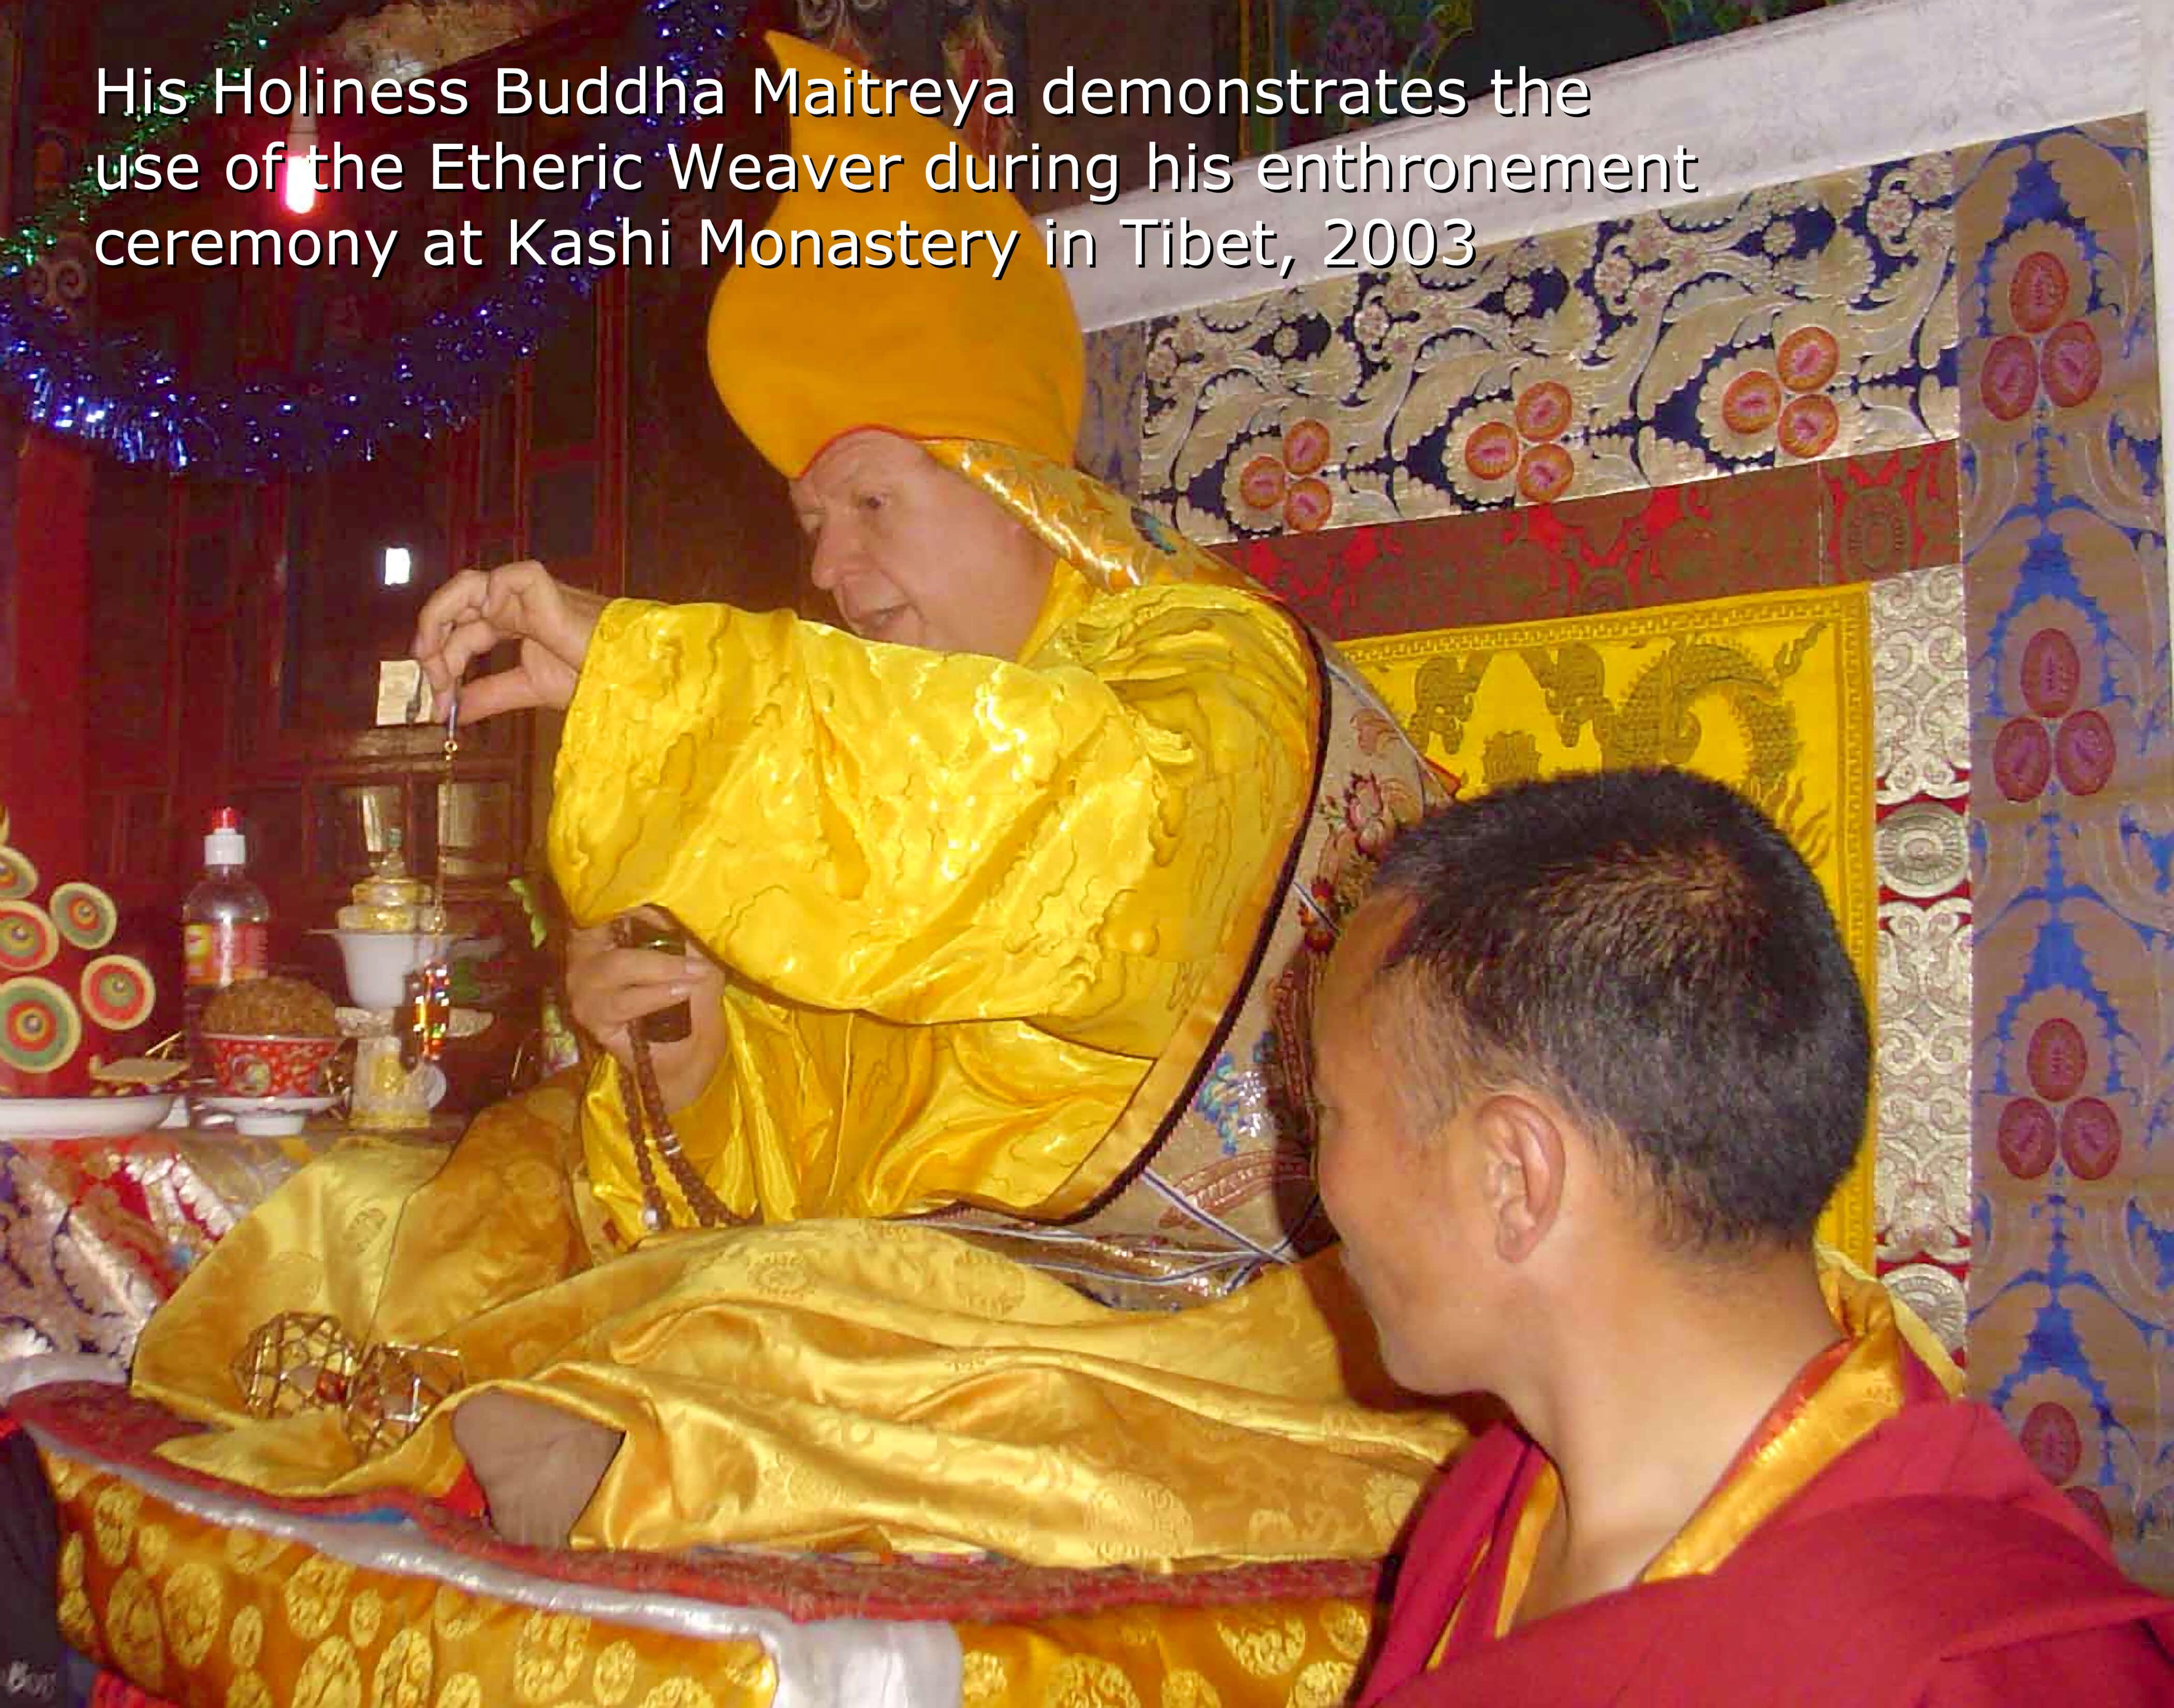 His Holiness Tulku Buddha Maitreya